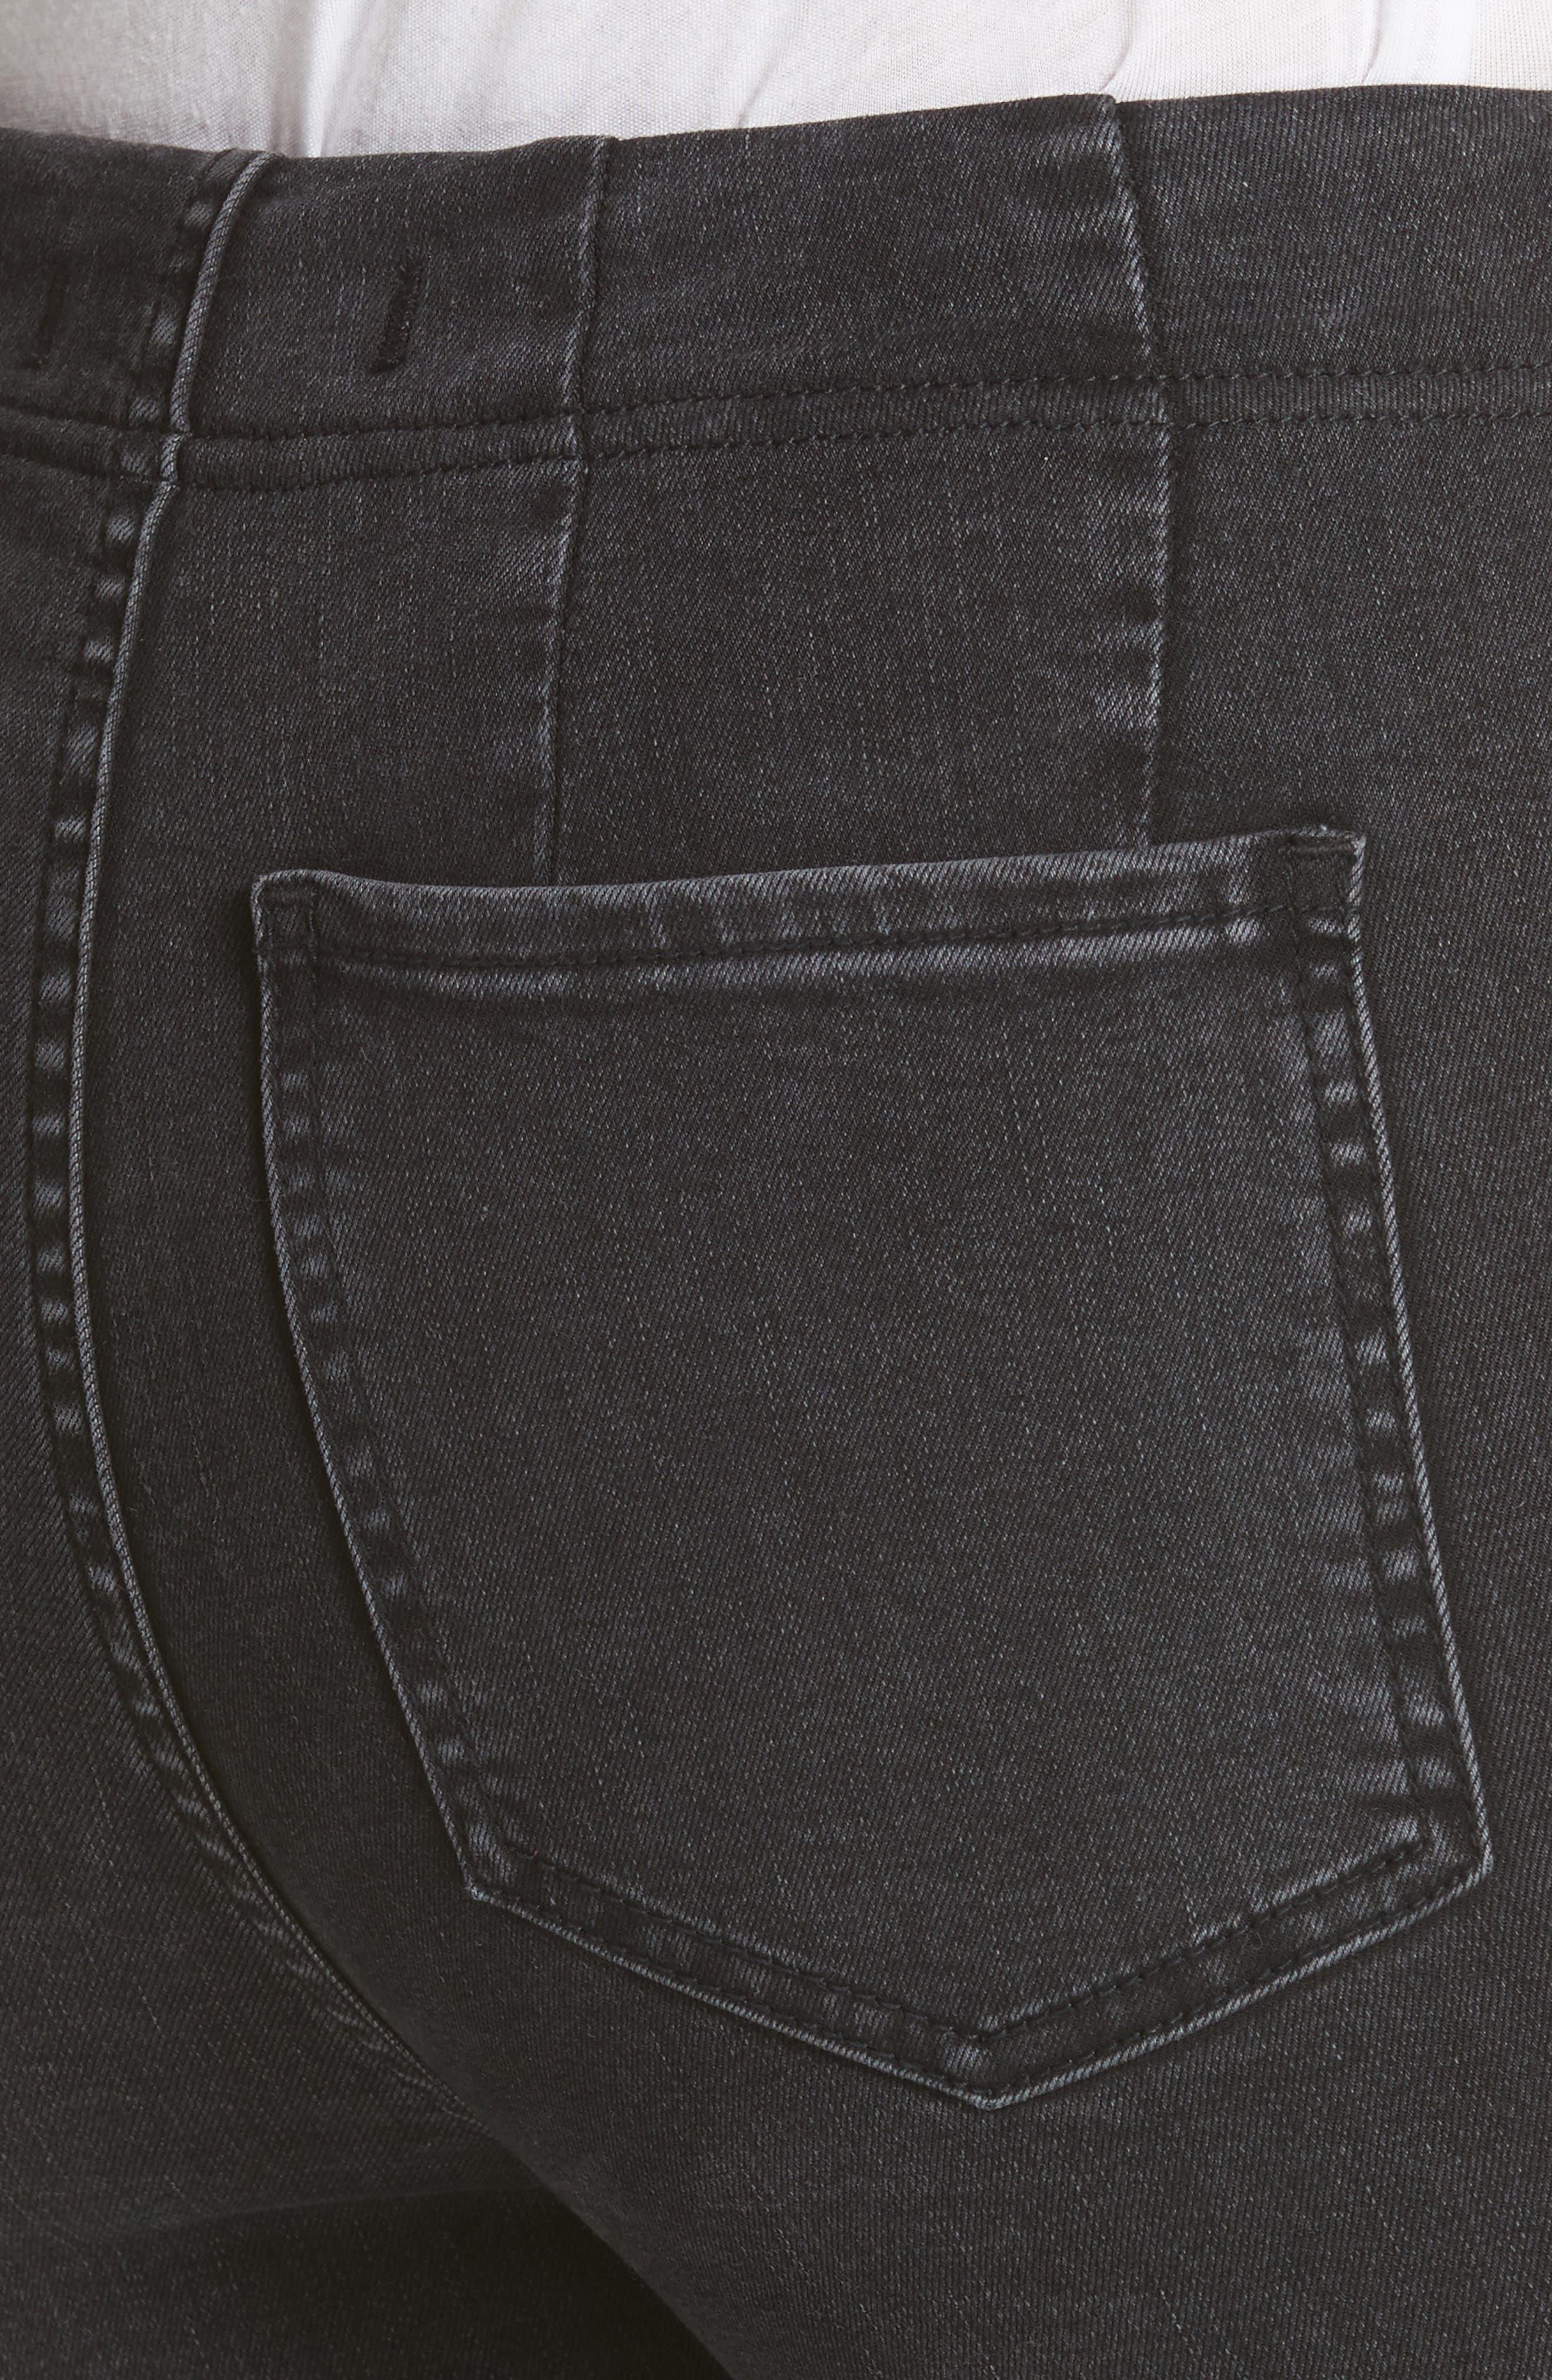 Ultra High Waist Crop Bootcut Jeans,                             Alternate thumbnail 4, color,                             Black